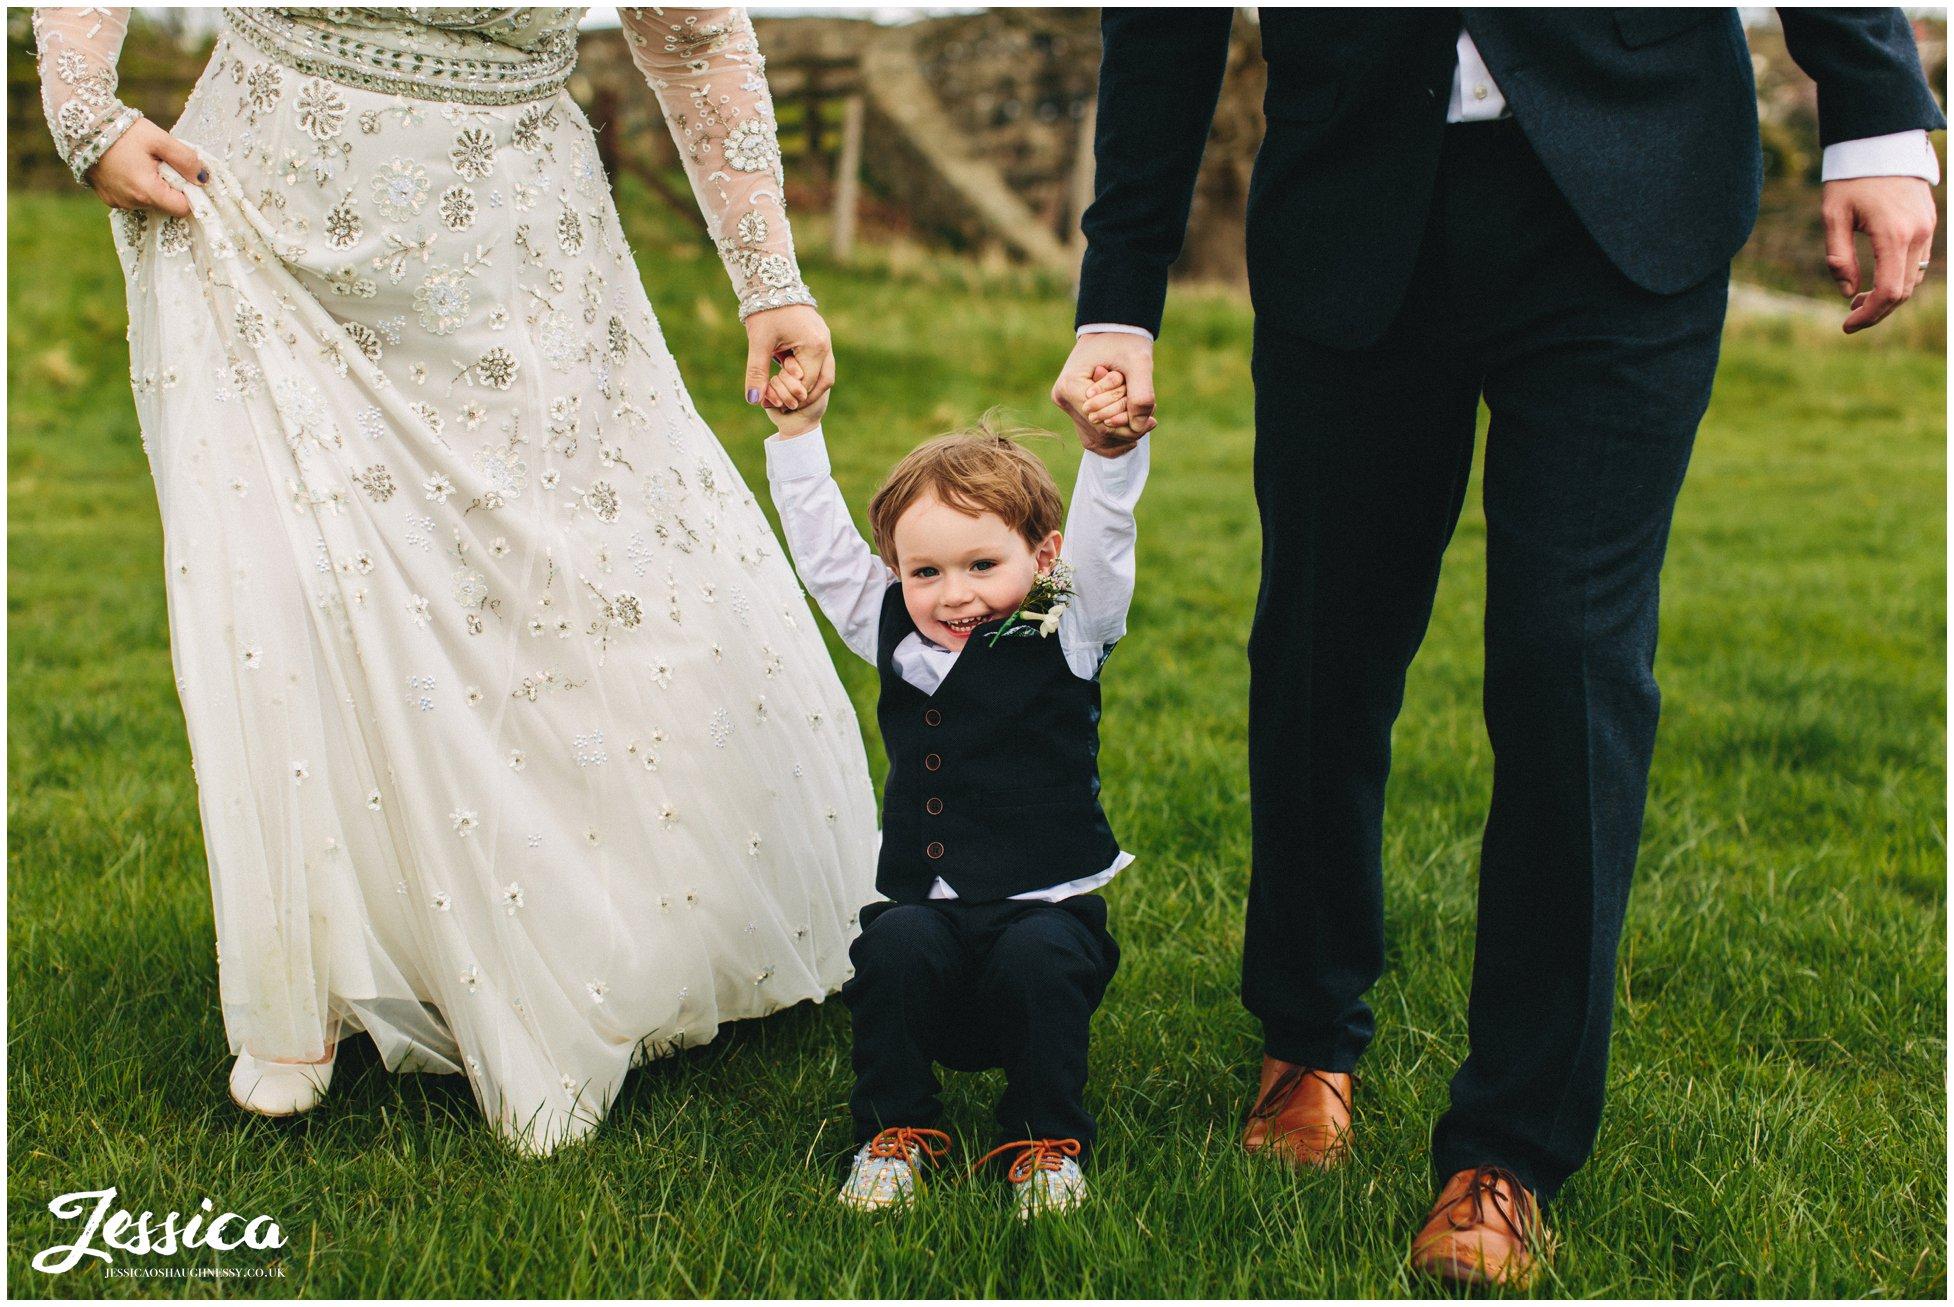 child holds parents hands at a wedding in trevor, wrexham